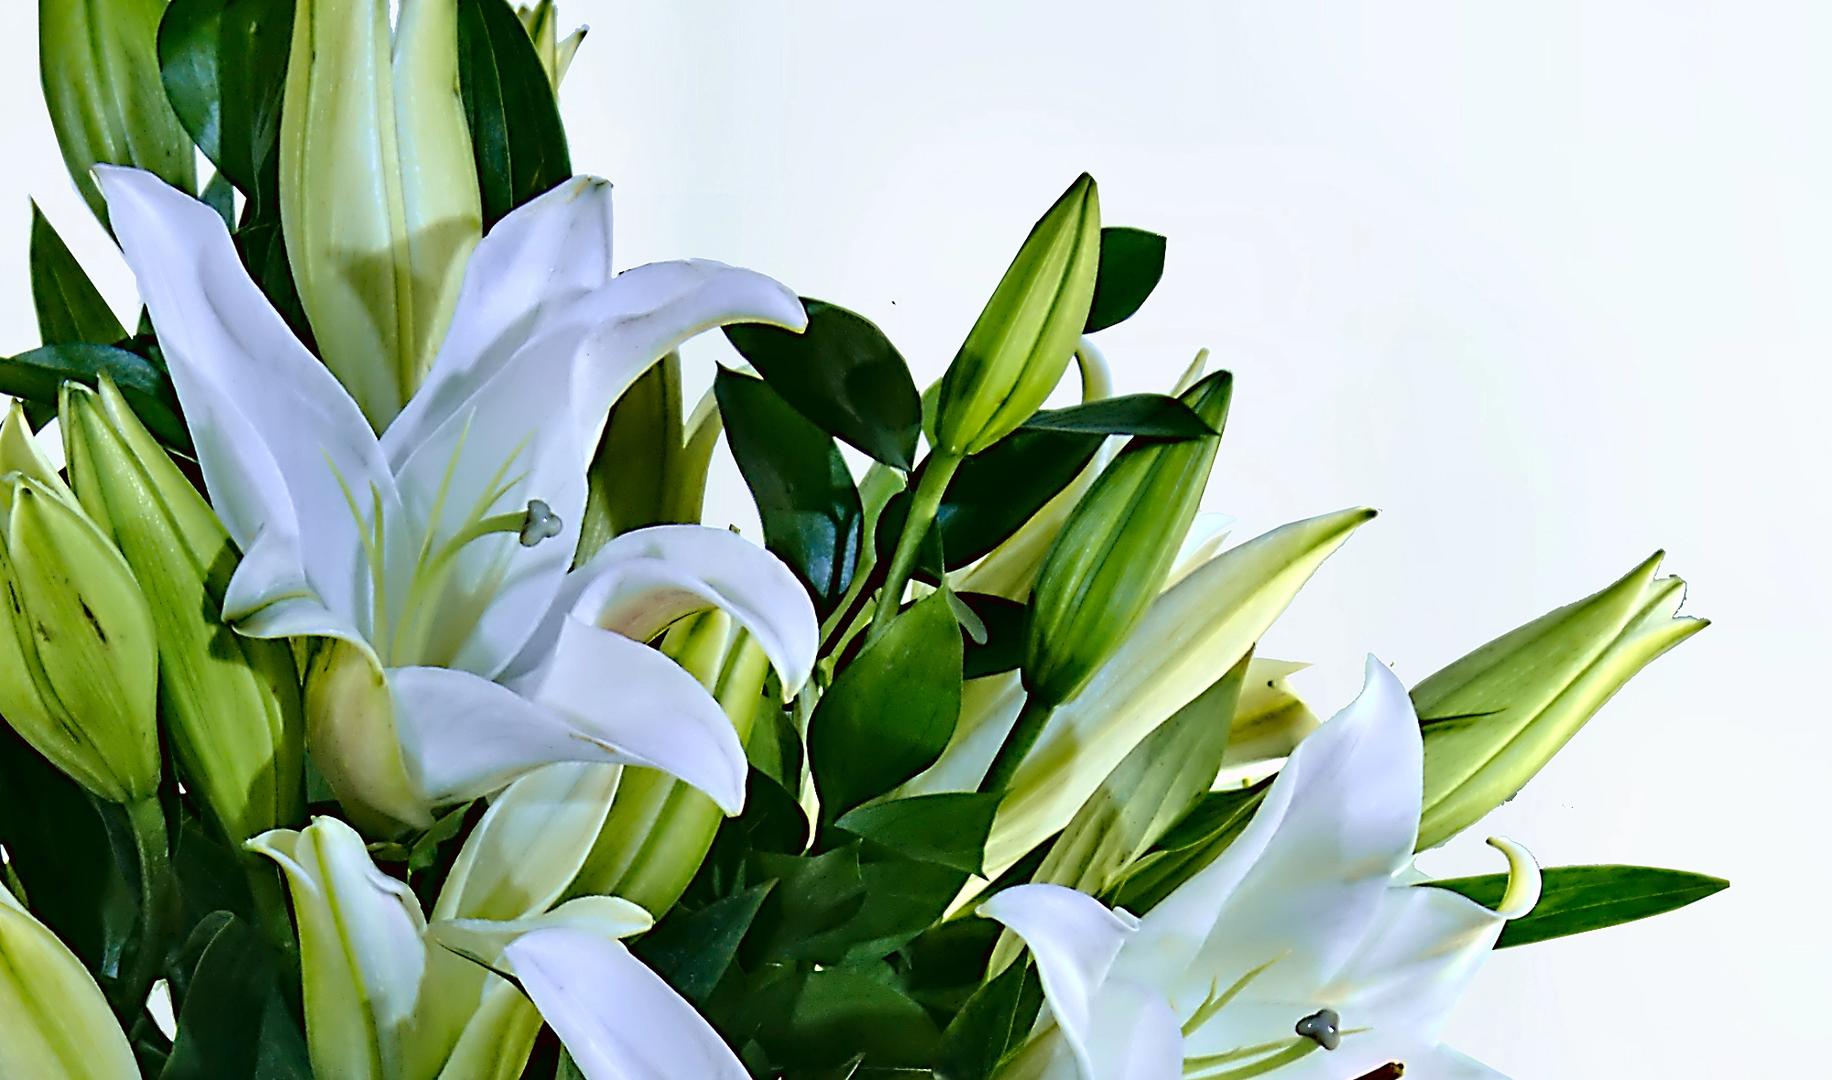 Espuma floral (1.0), Ruscus (6.0), Papel empavonado Beige (2.0), CINTASATIN BEIGE (3.0), Liliums Blancos (10.0)